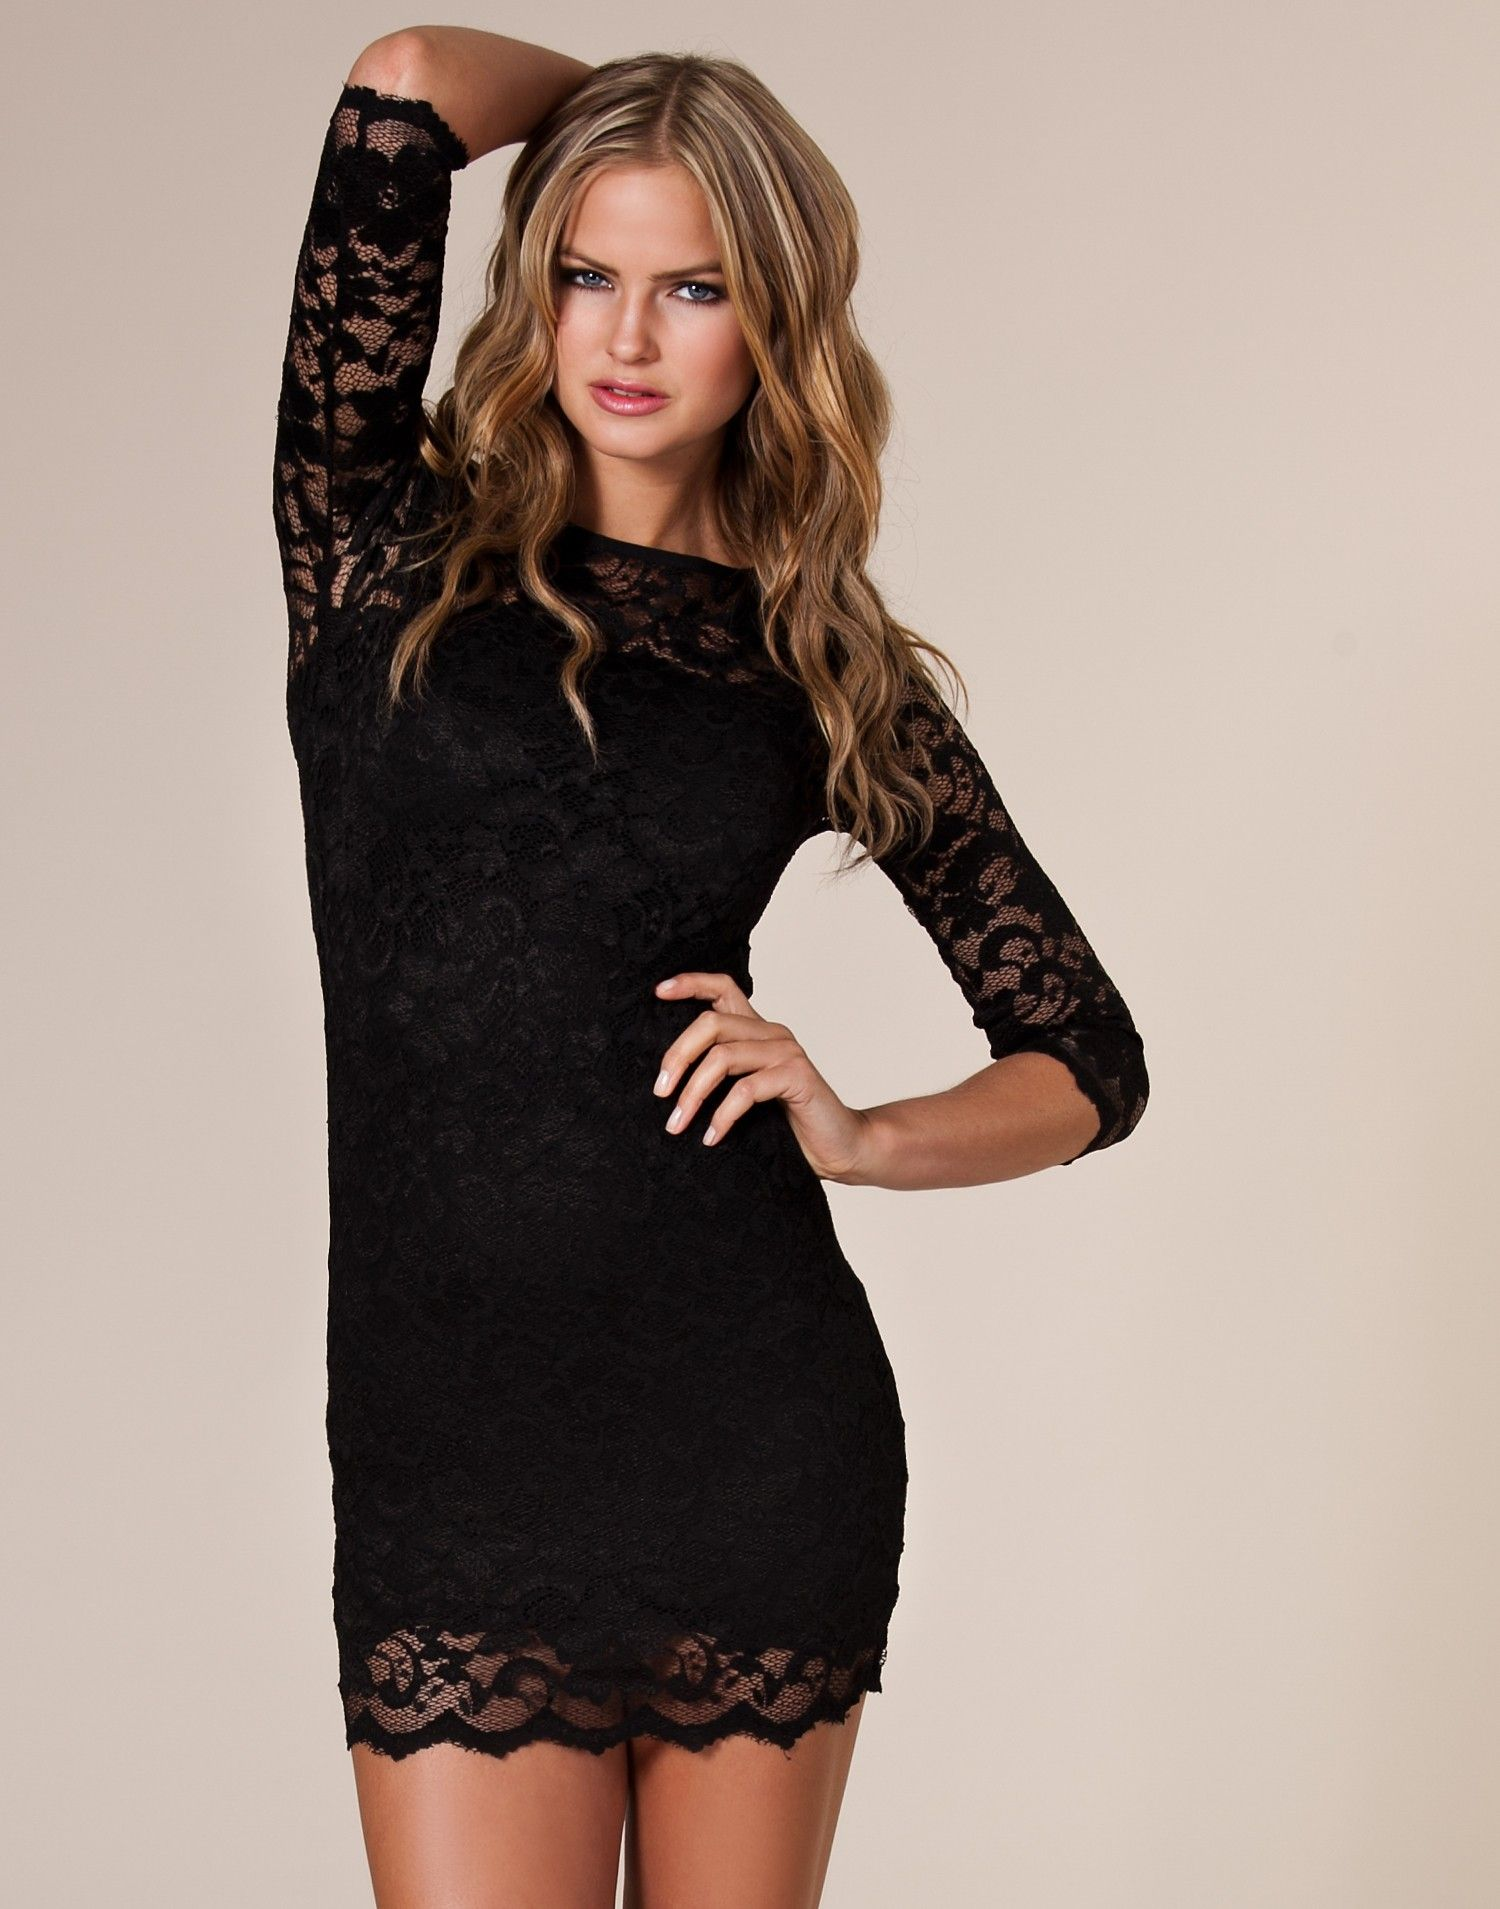 Image by Alaina Lober on Classy, Not Trashy Black lace